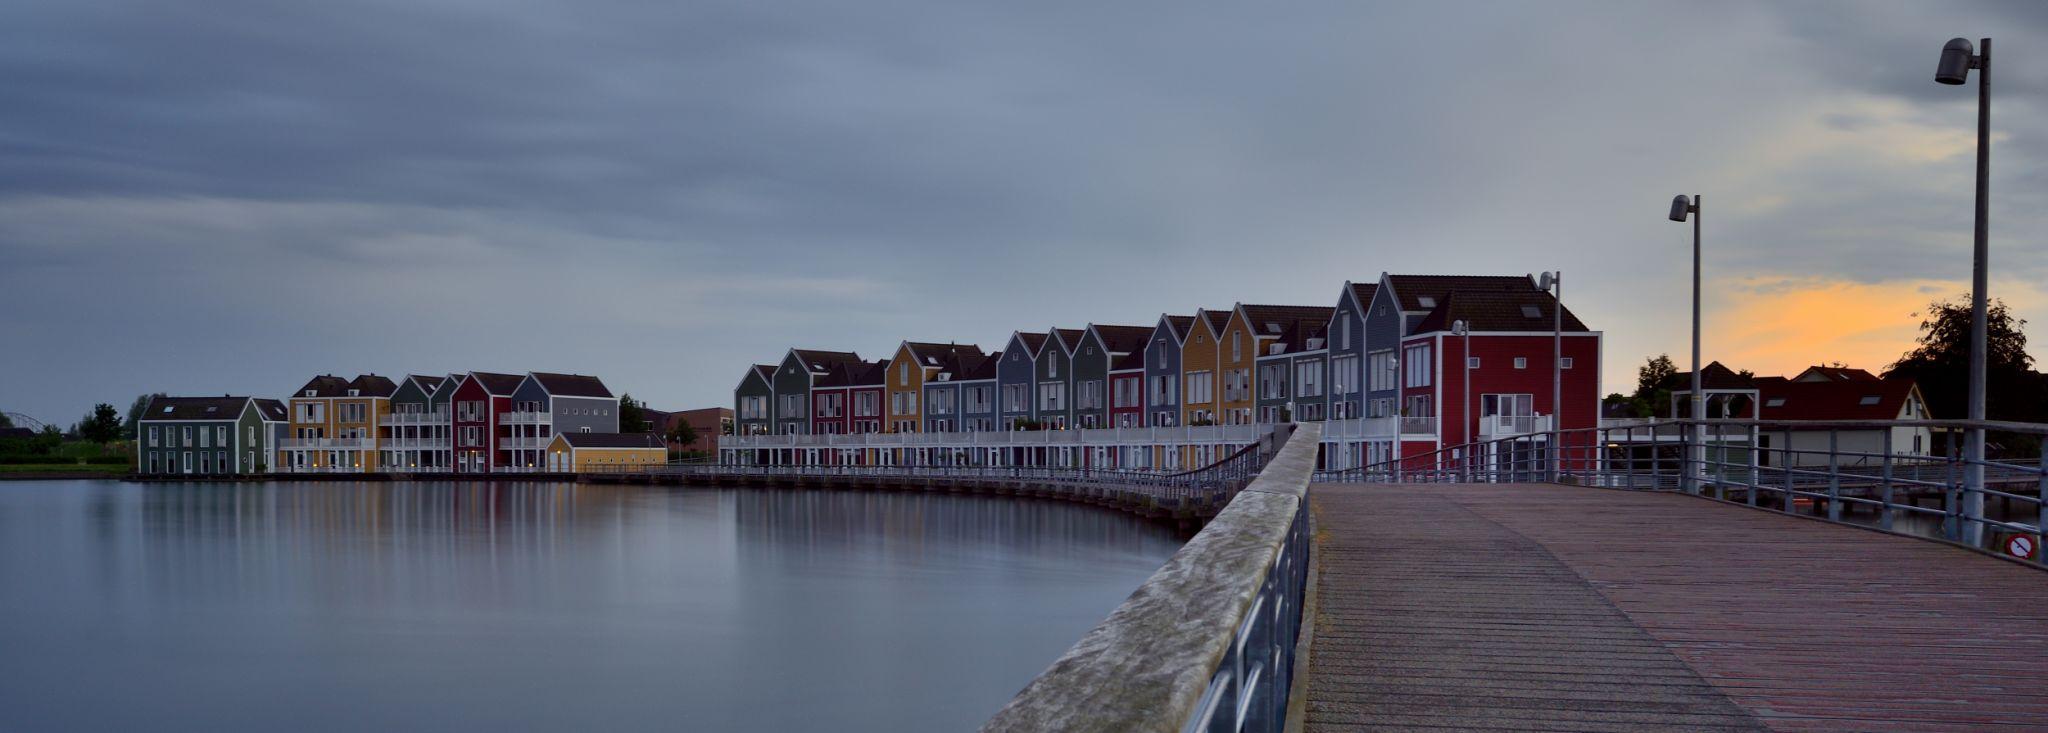 Rainbow colored houses on Rietplas, Houten, Netherlands